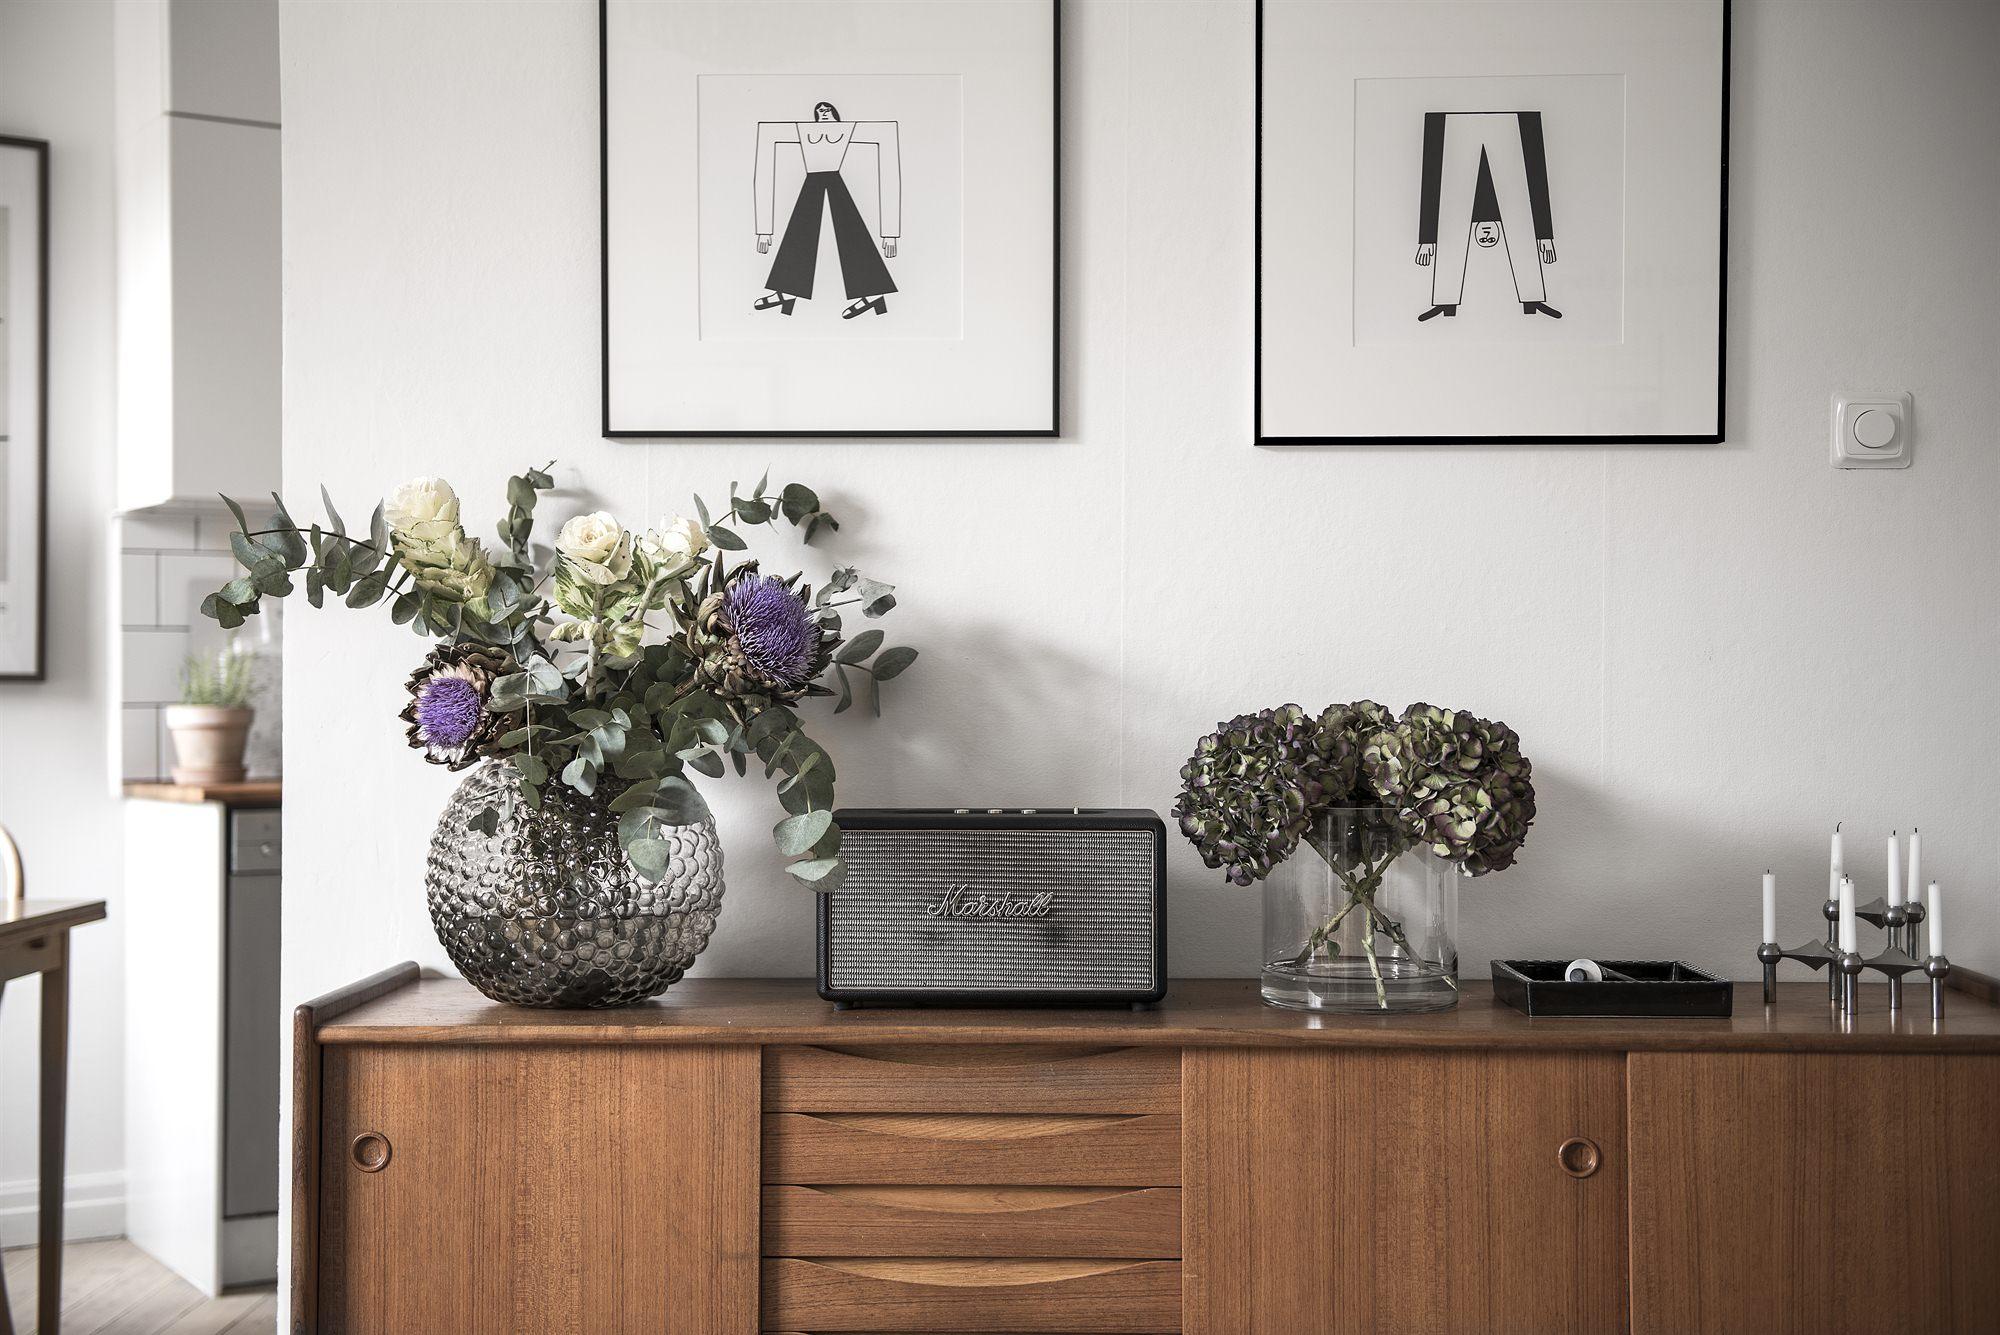 Decorar con aparadores vintage chic interiores chic for Decorar un minipiso